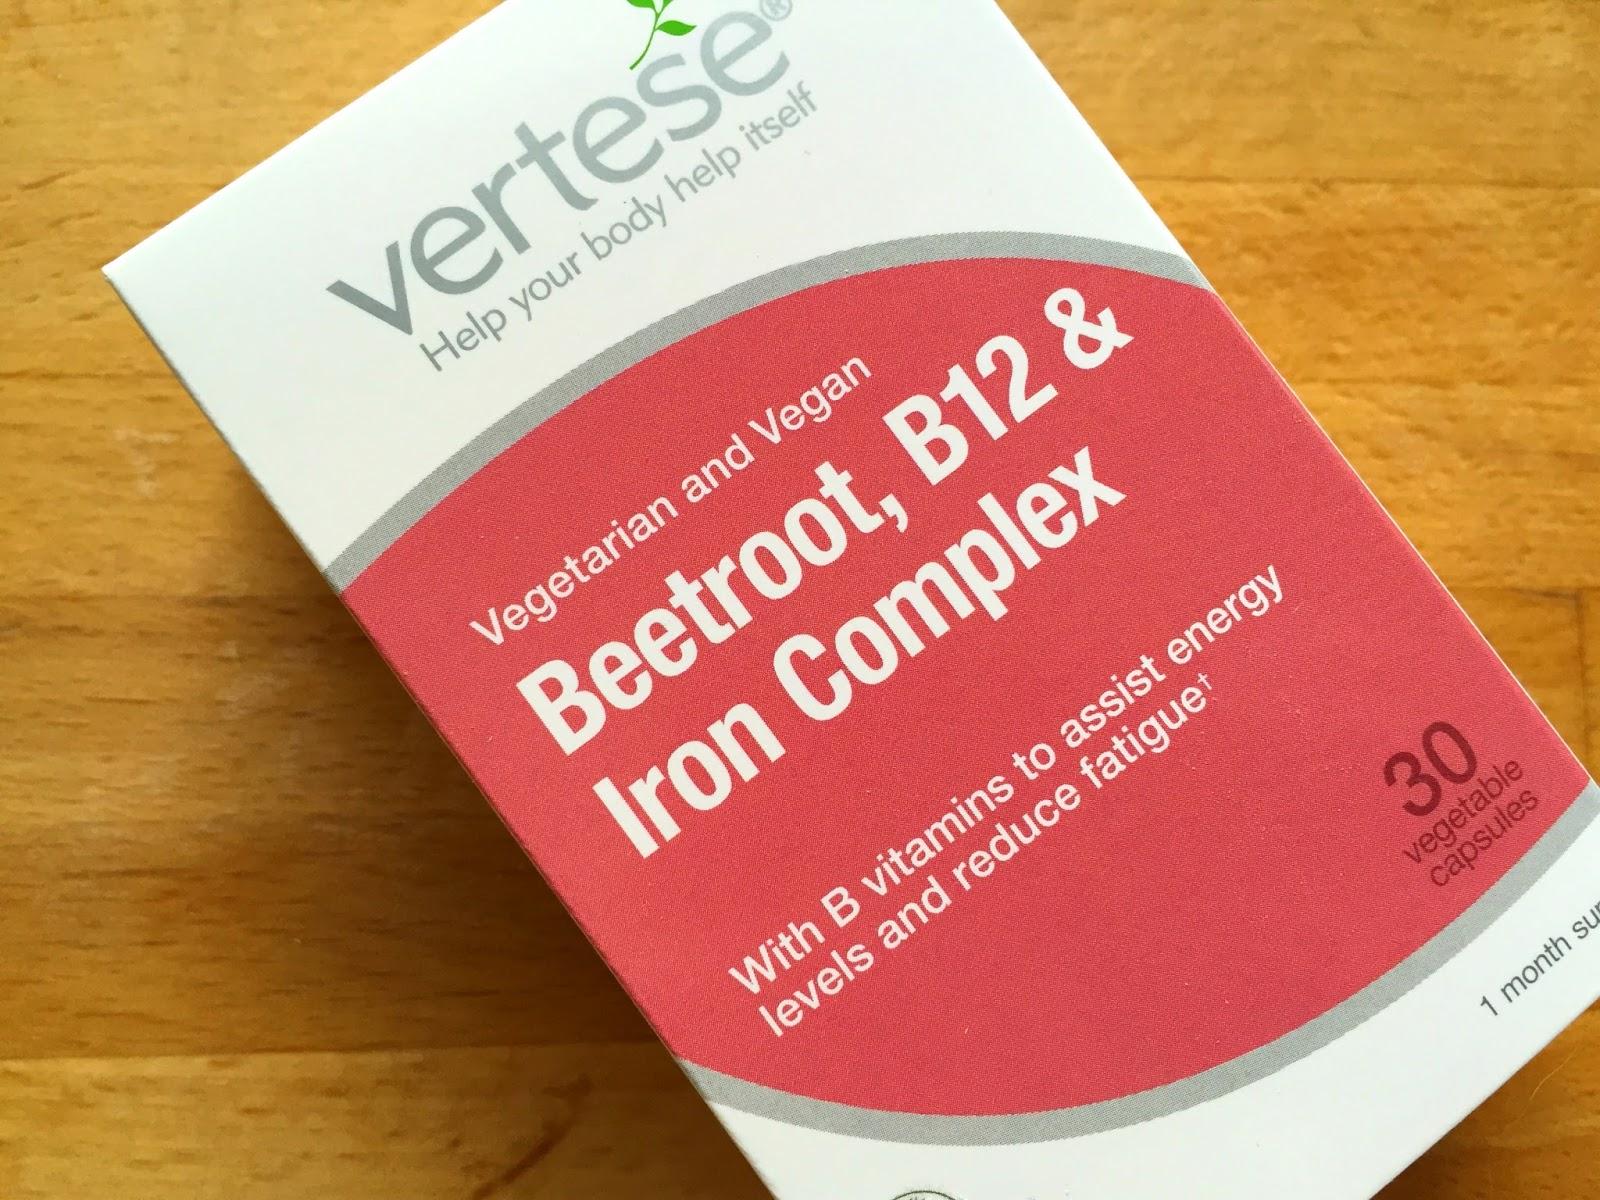 Vertese Beetroot, B12 & Iron vegan supplements